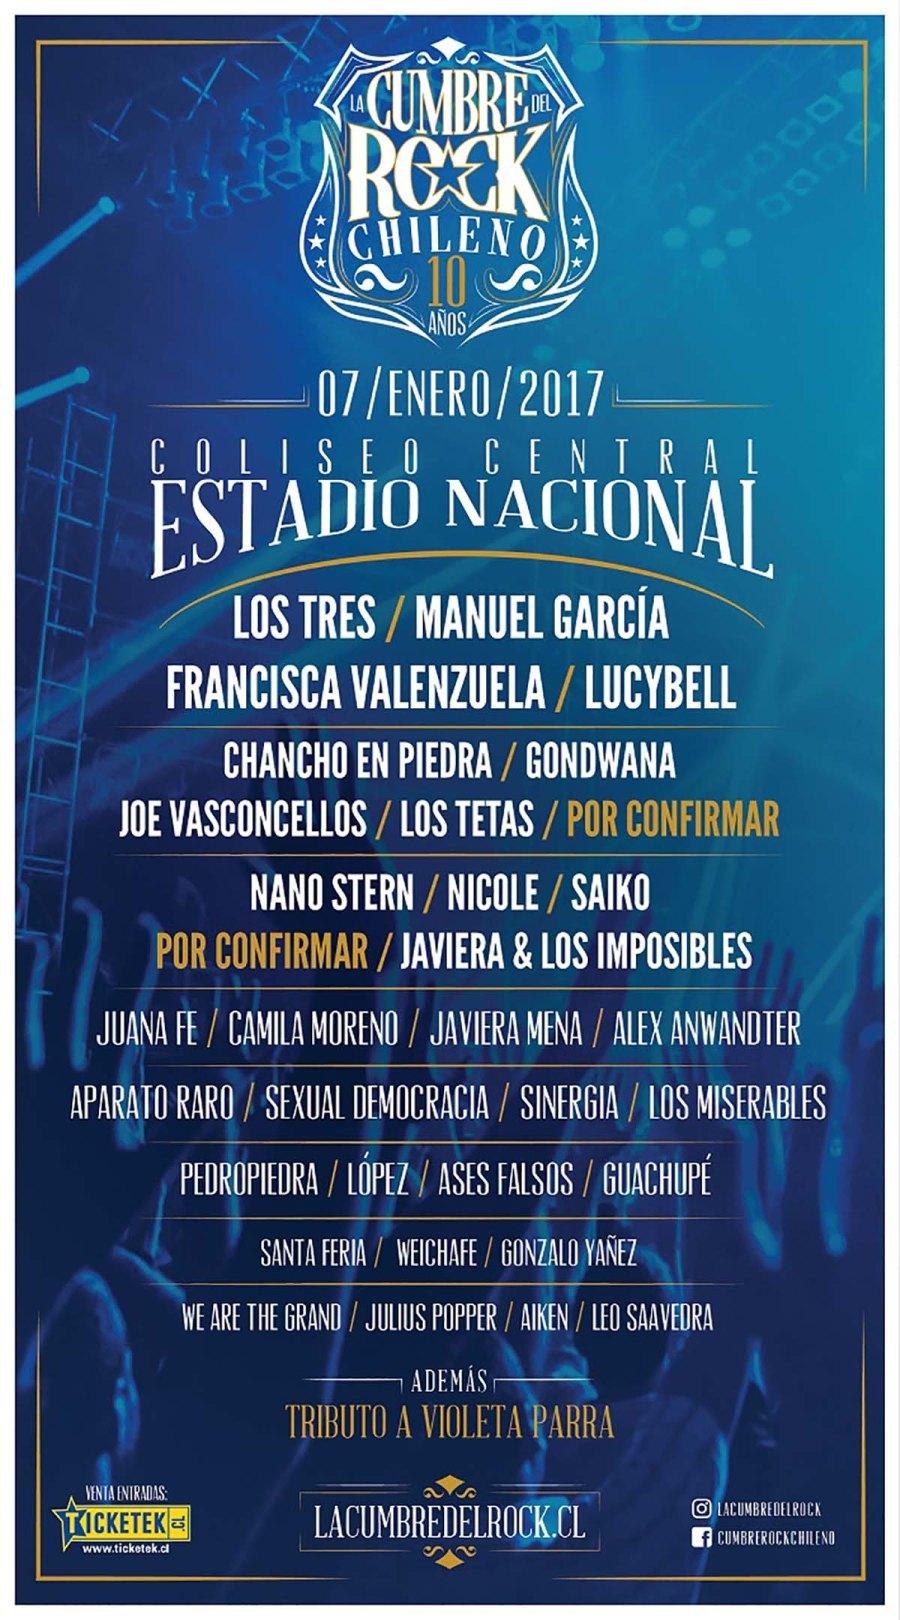 Cartel-Cumbre-del-Rock-Chileno-2017.jpg